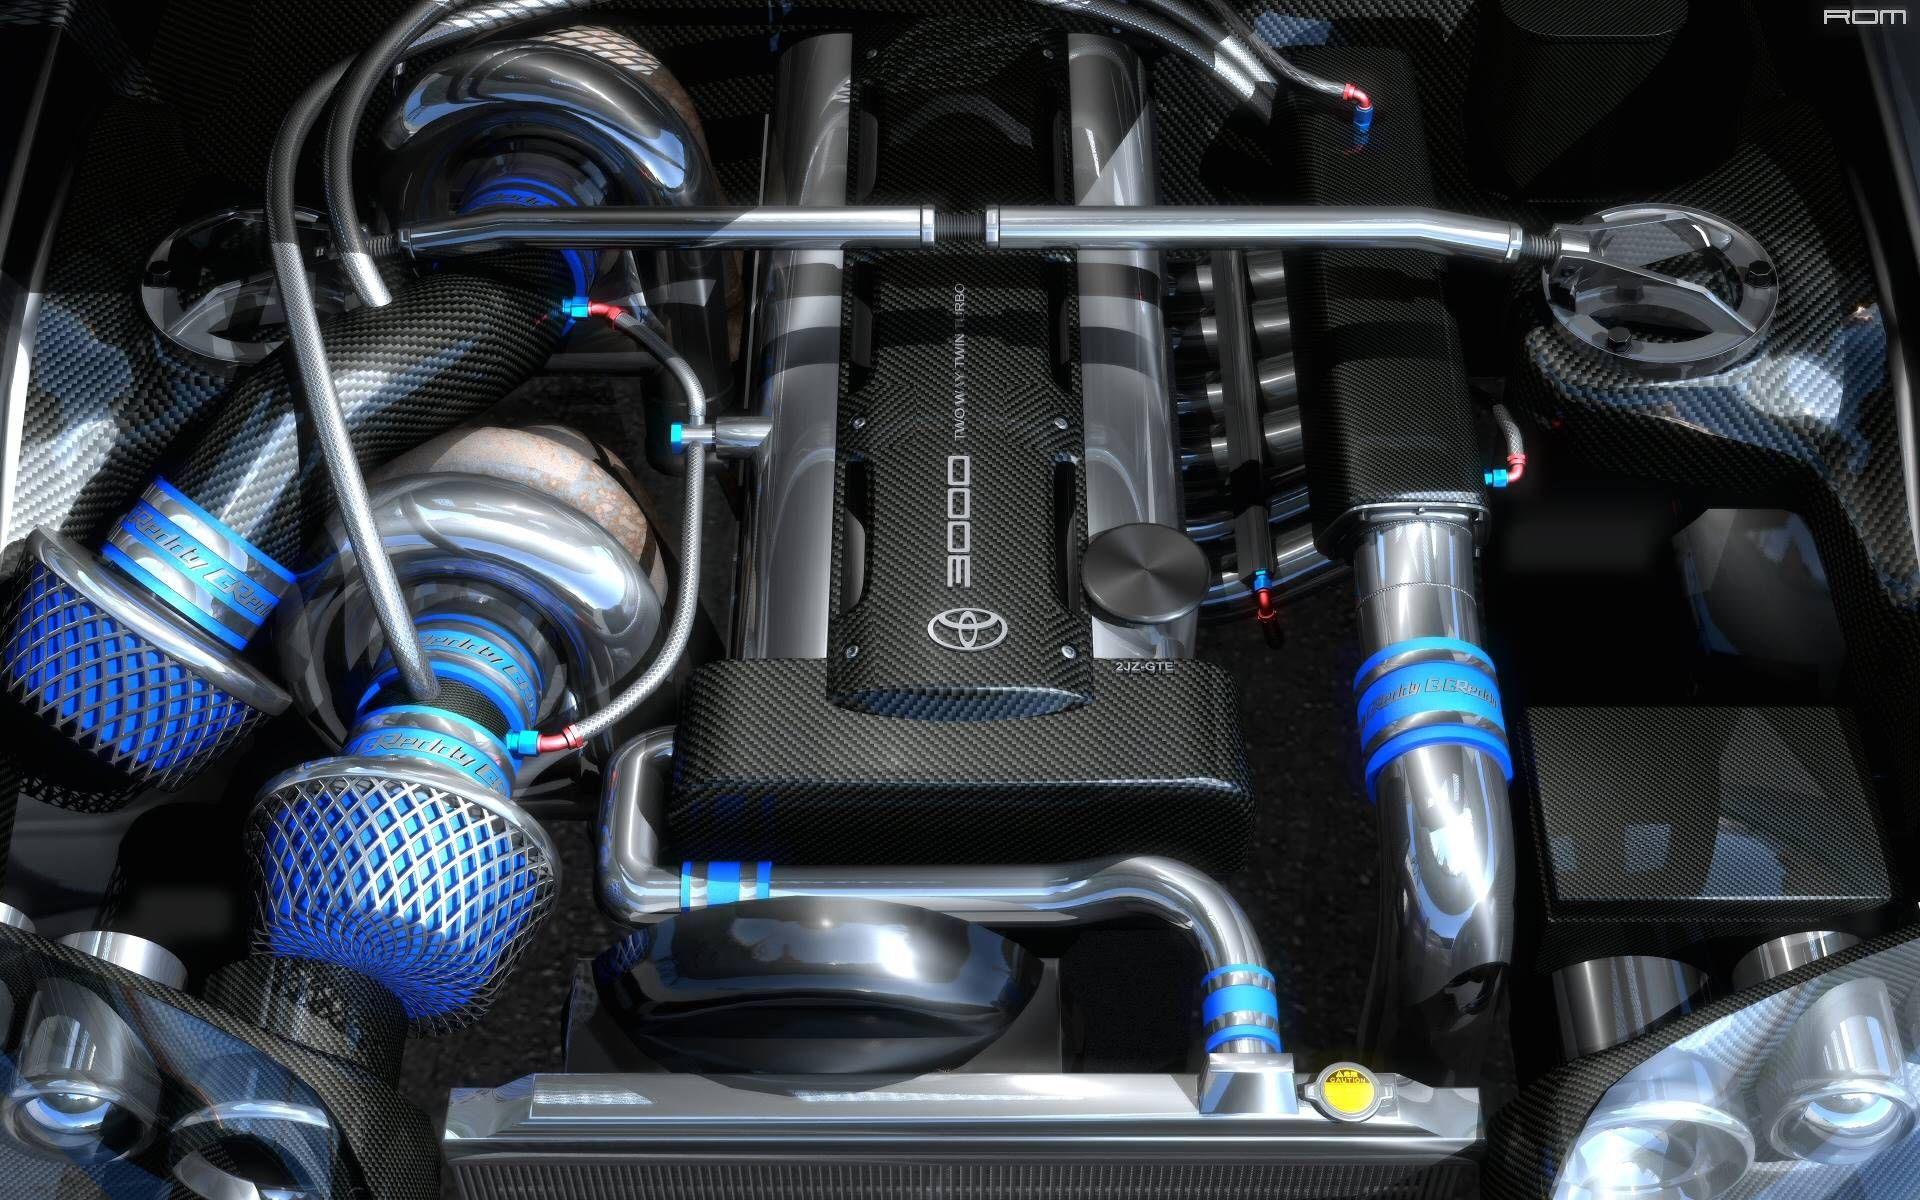 Twin Turbo Toyota Supra Engine (2JZ) (1920x1200) love